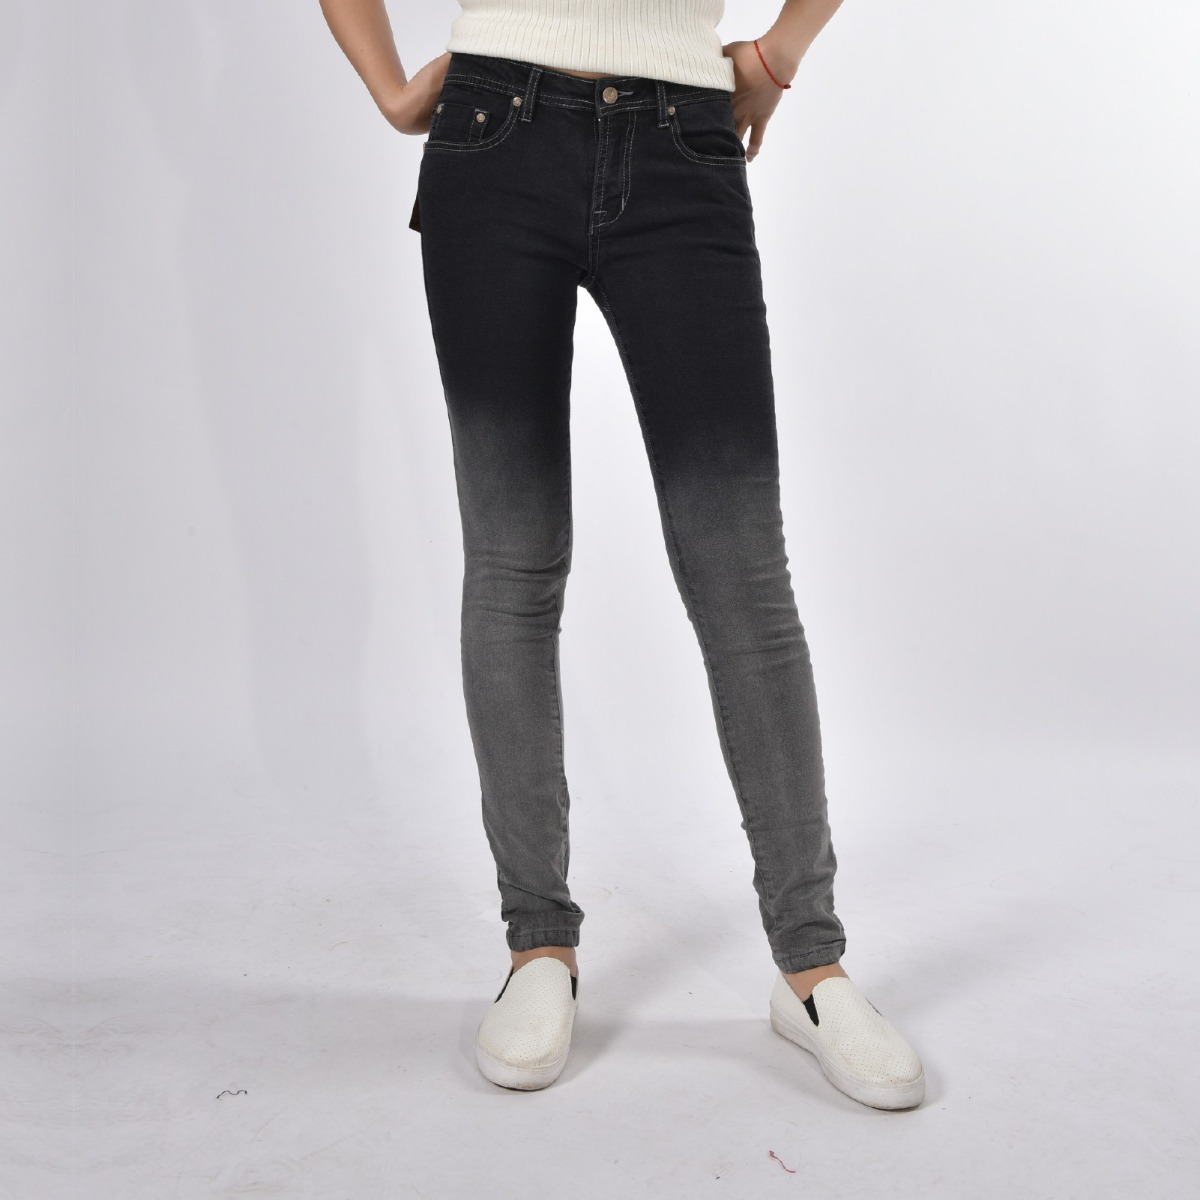 Quần jeans - WCJ6004